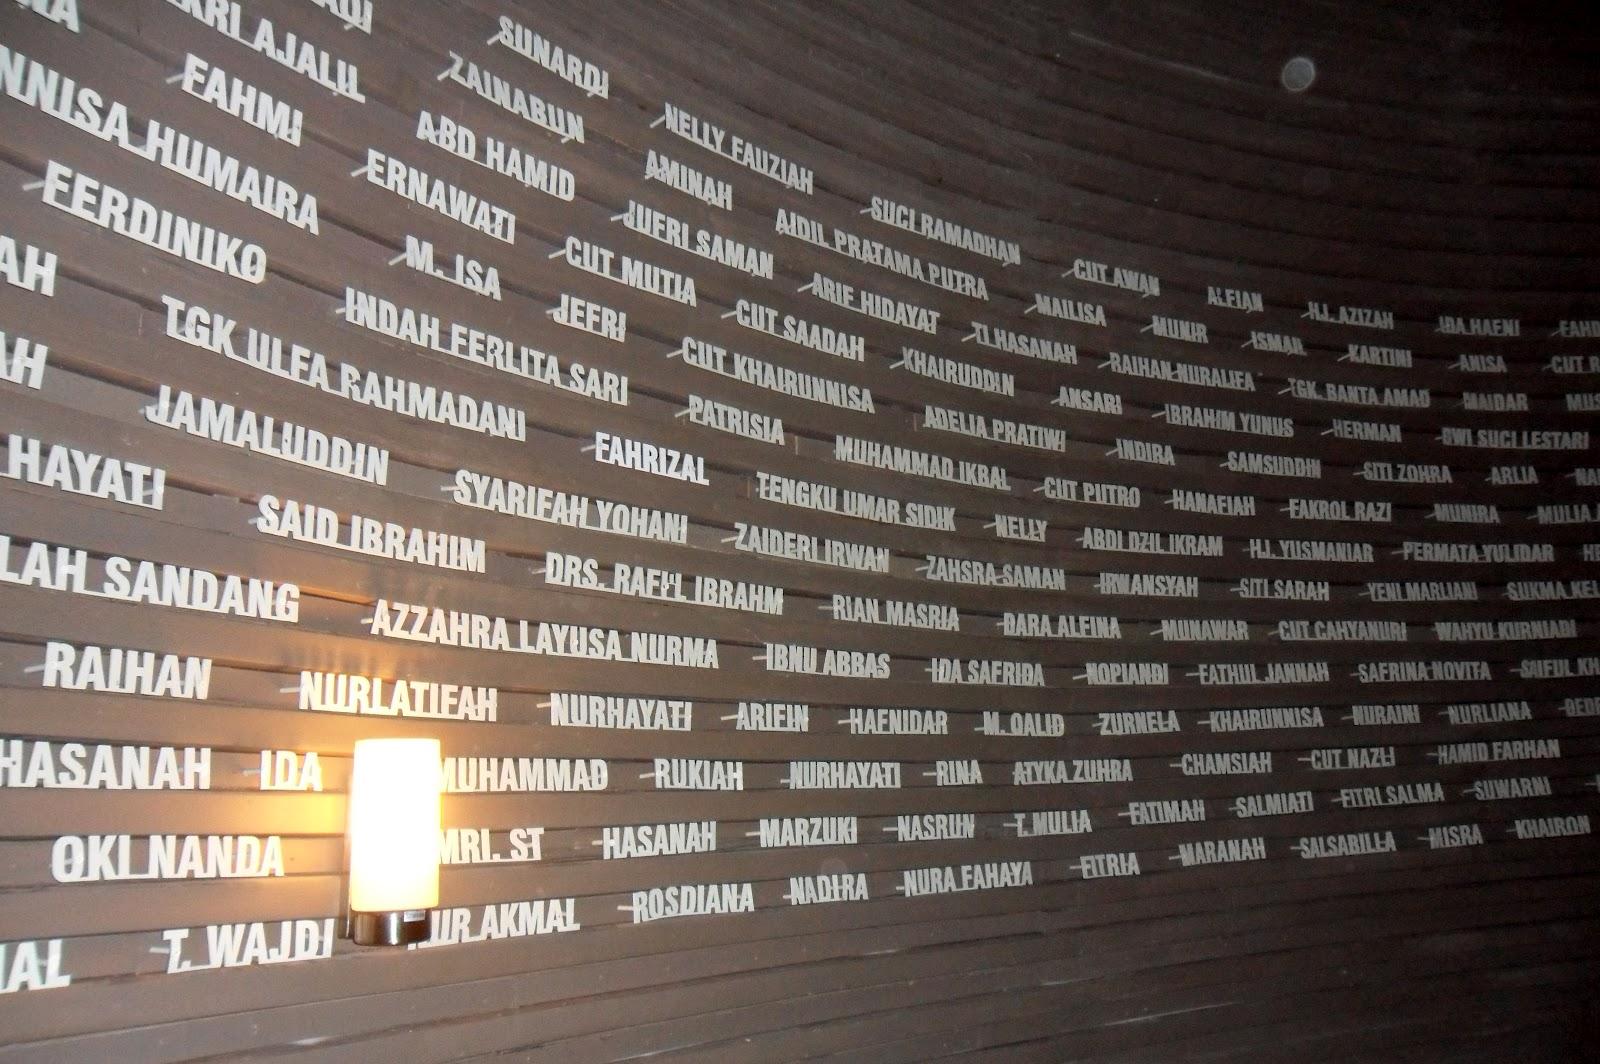 Museum Tsunami Aceh: Menjelajahi Museum Tsunami Aceh